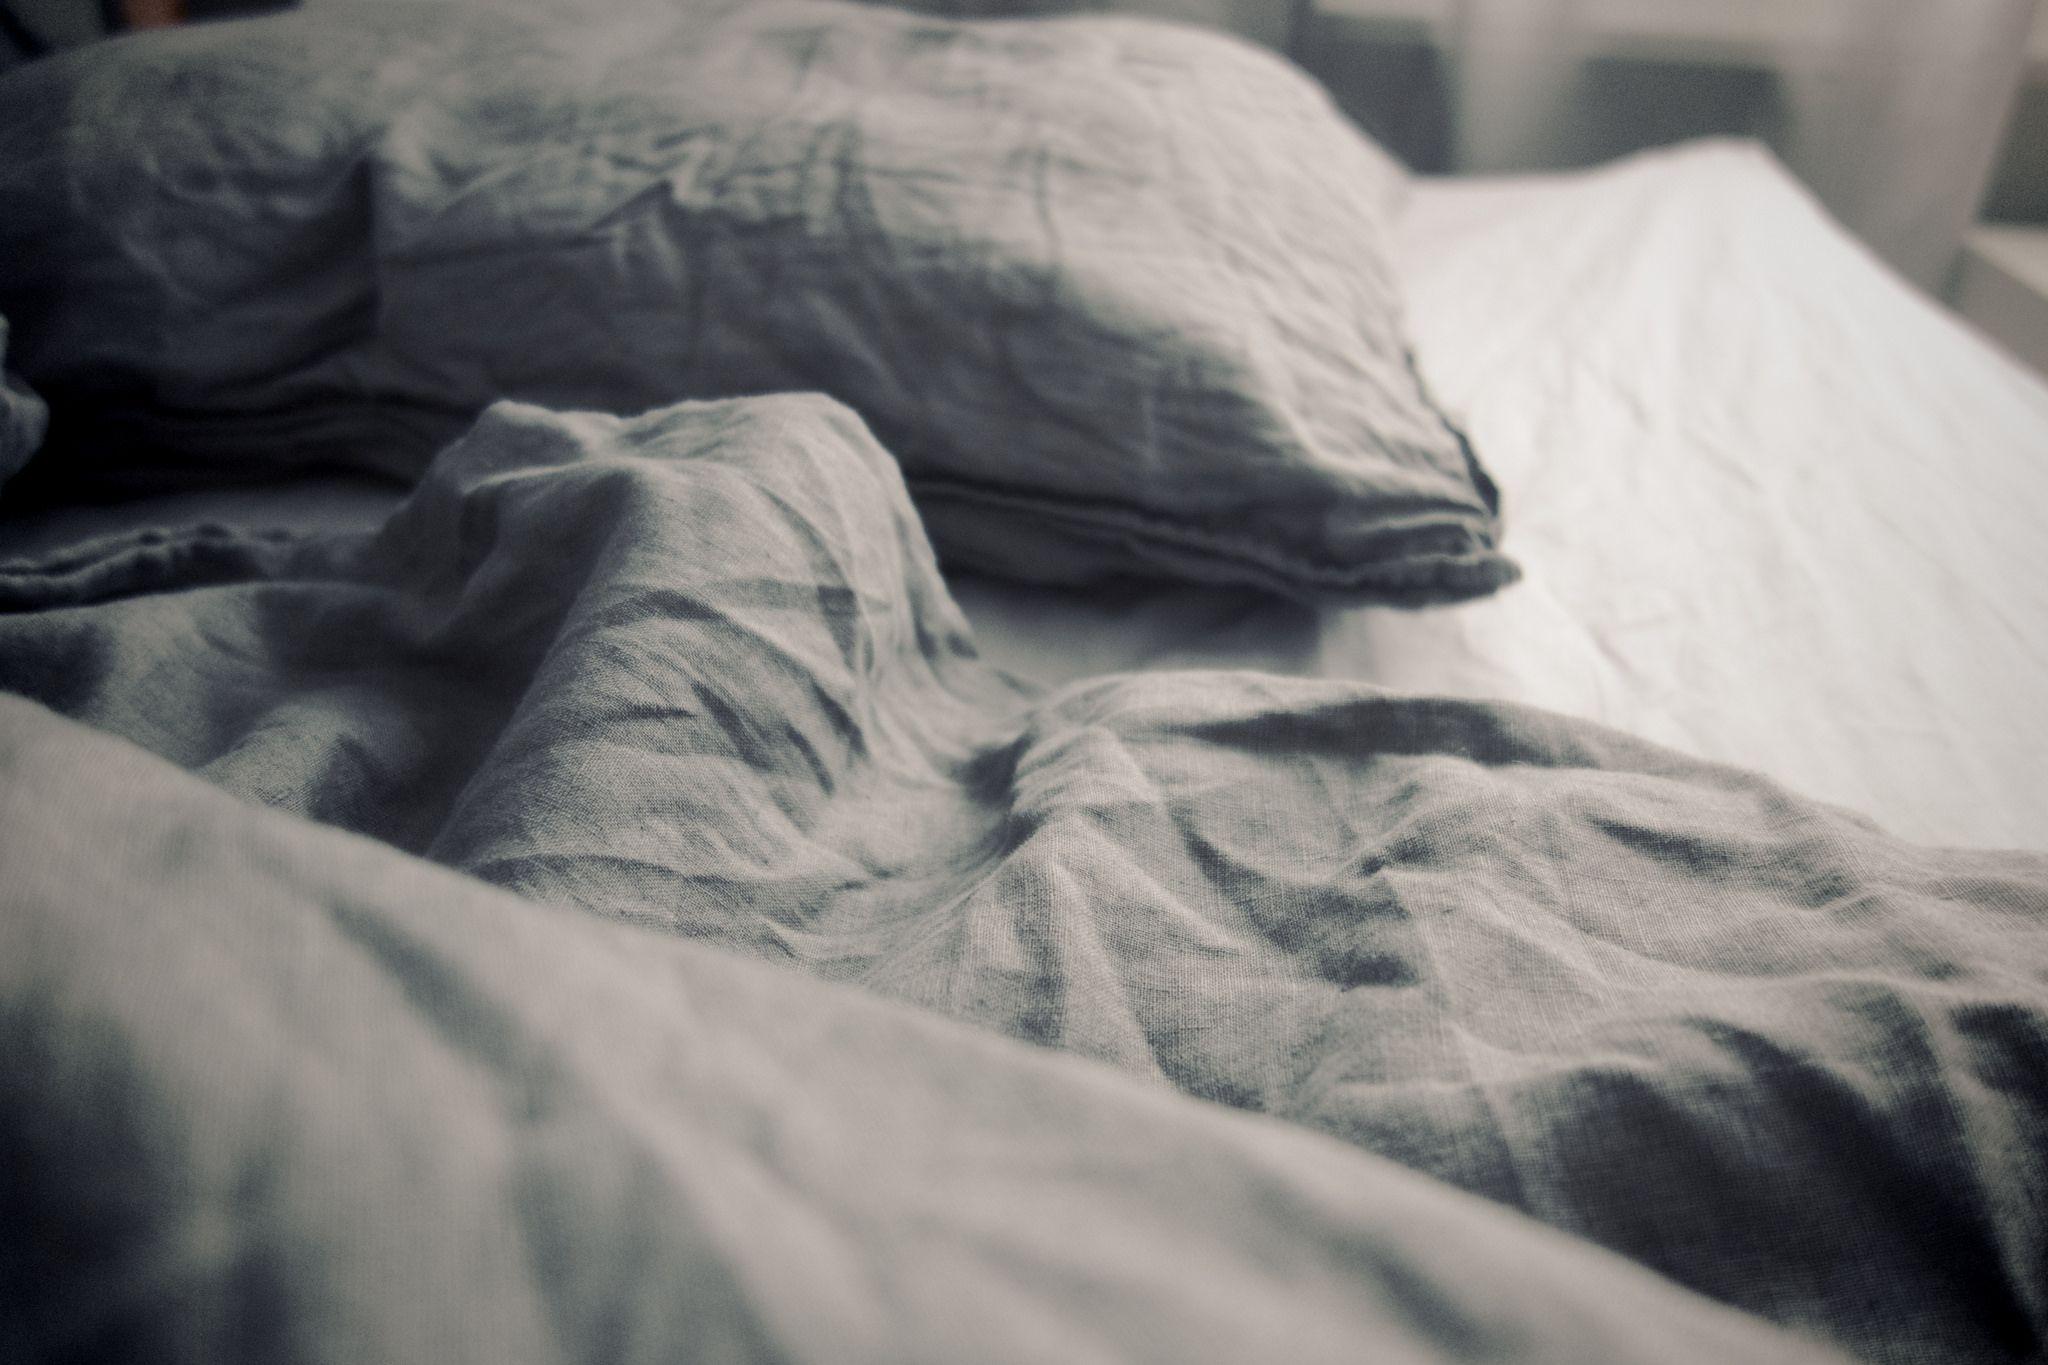 2_17_Bed sheets